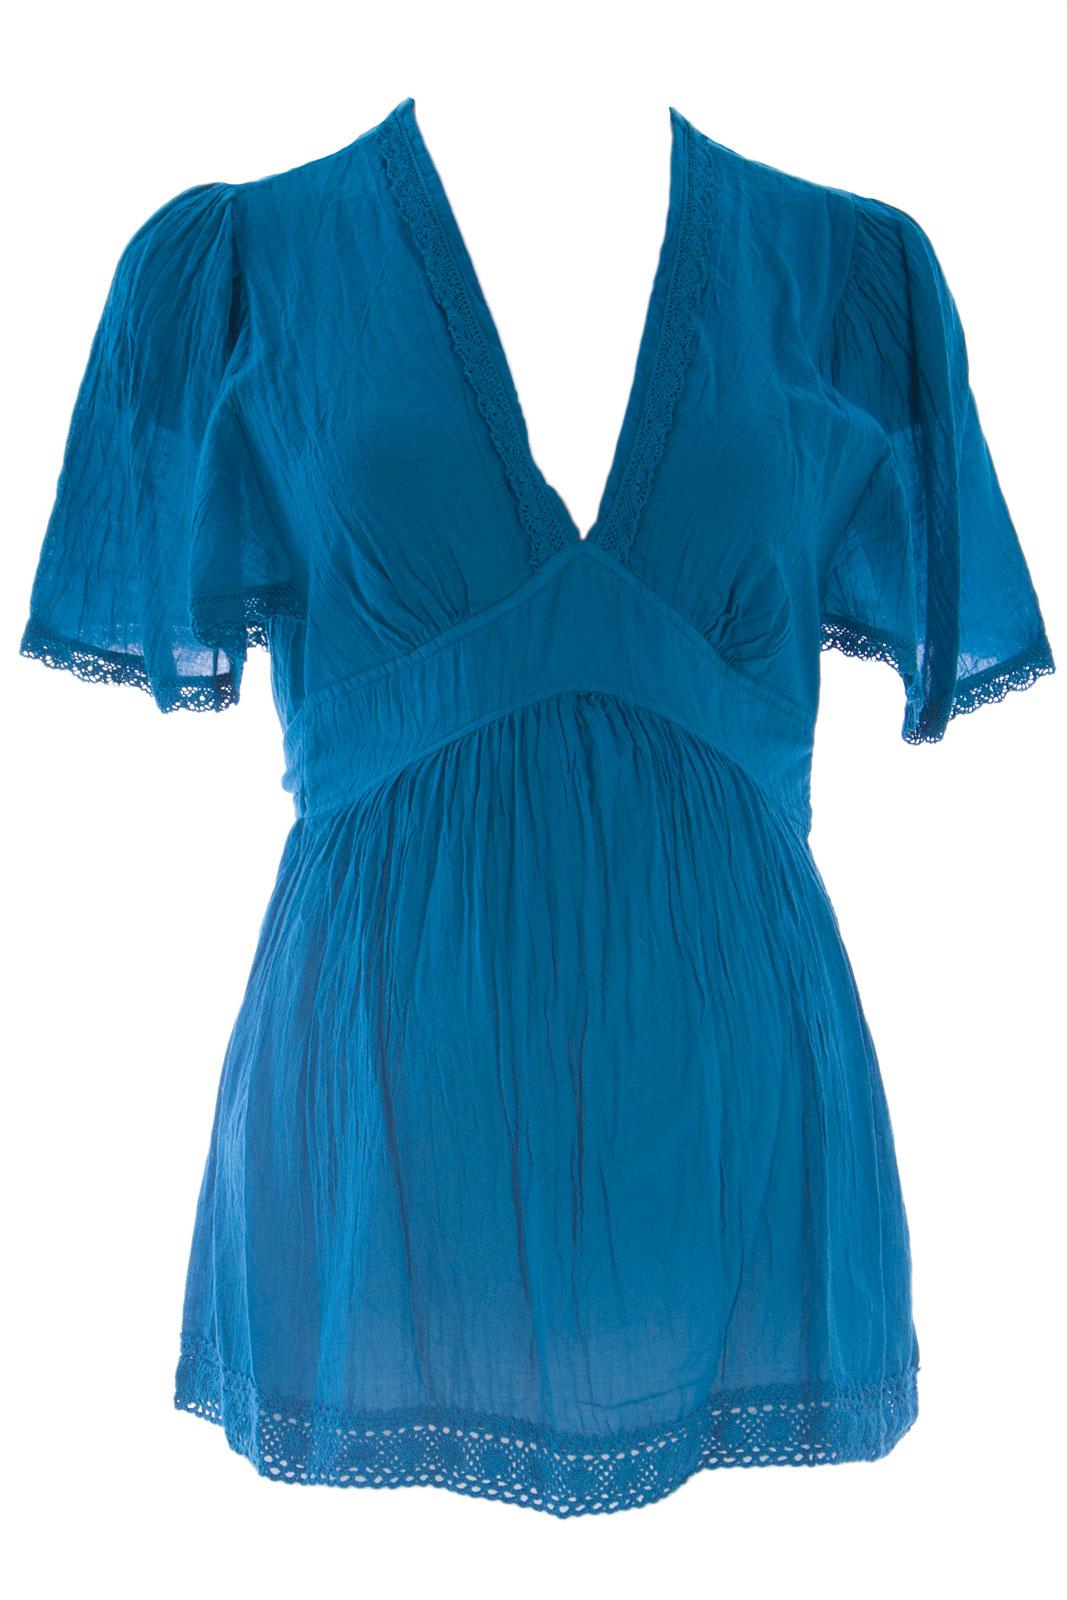 OLIAN Maternity Women's Batwing Sleeve Waist Tie Tunic Top XS